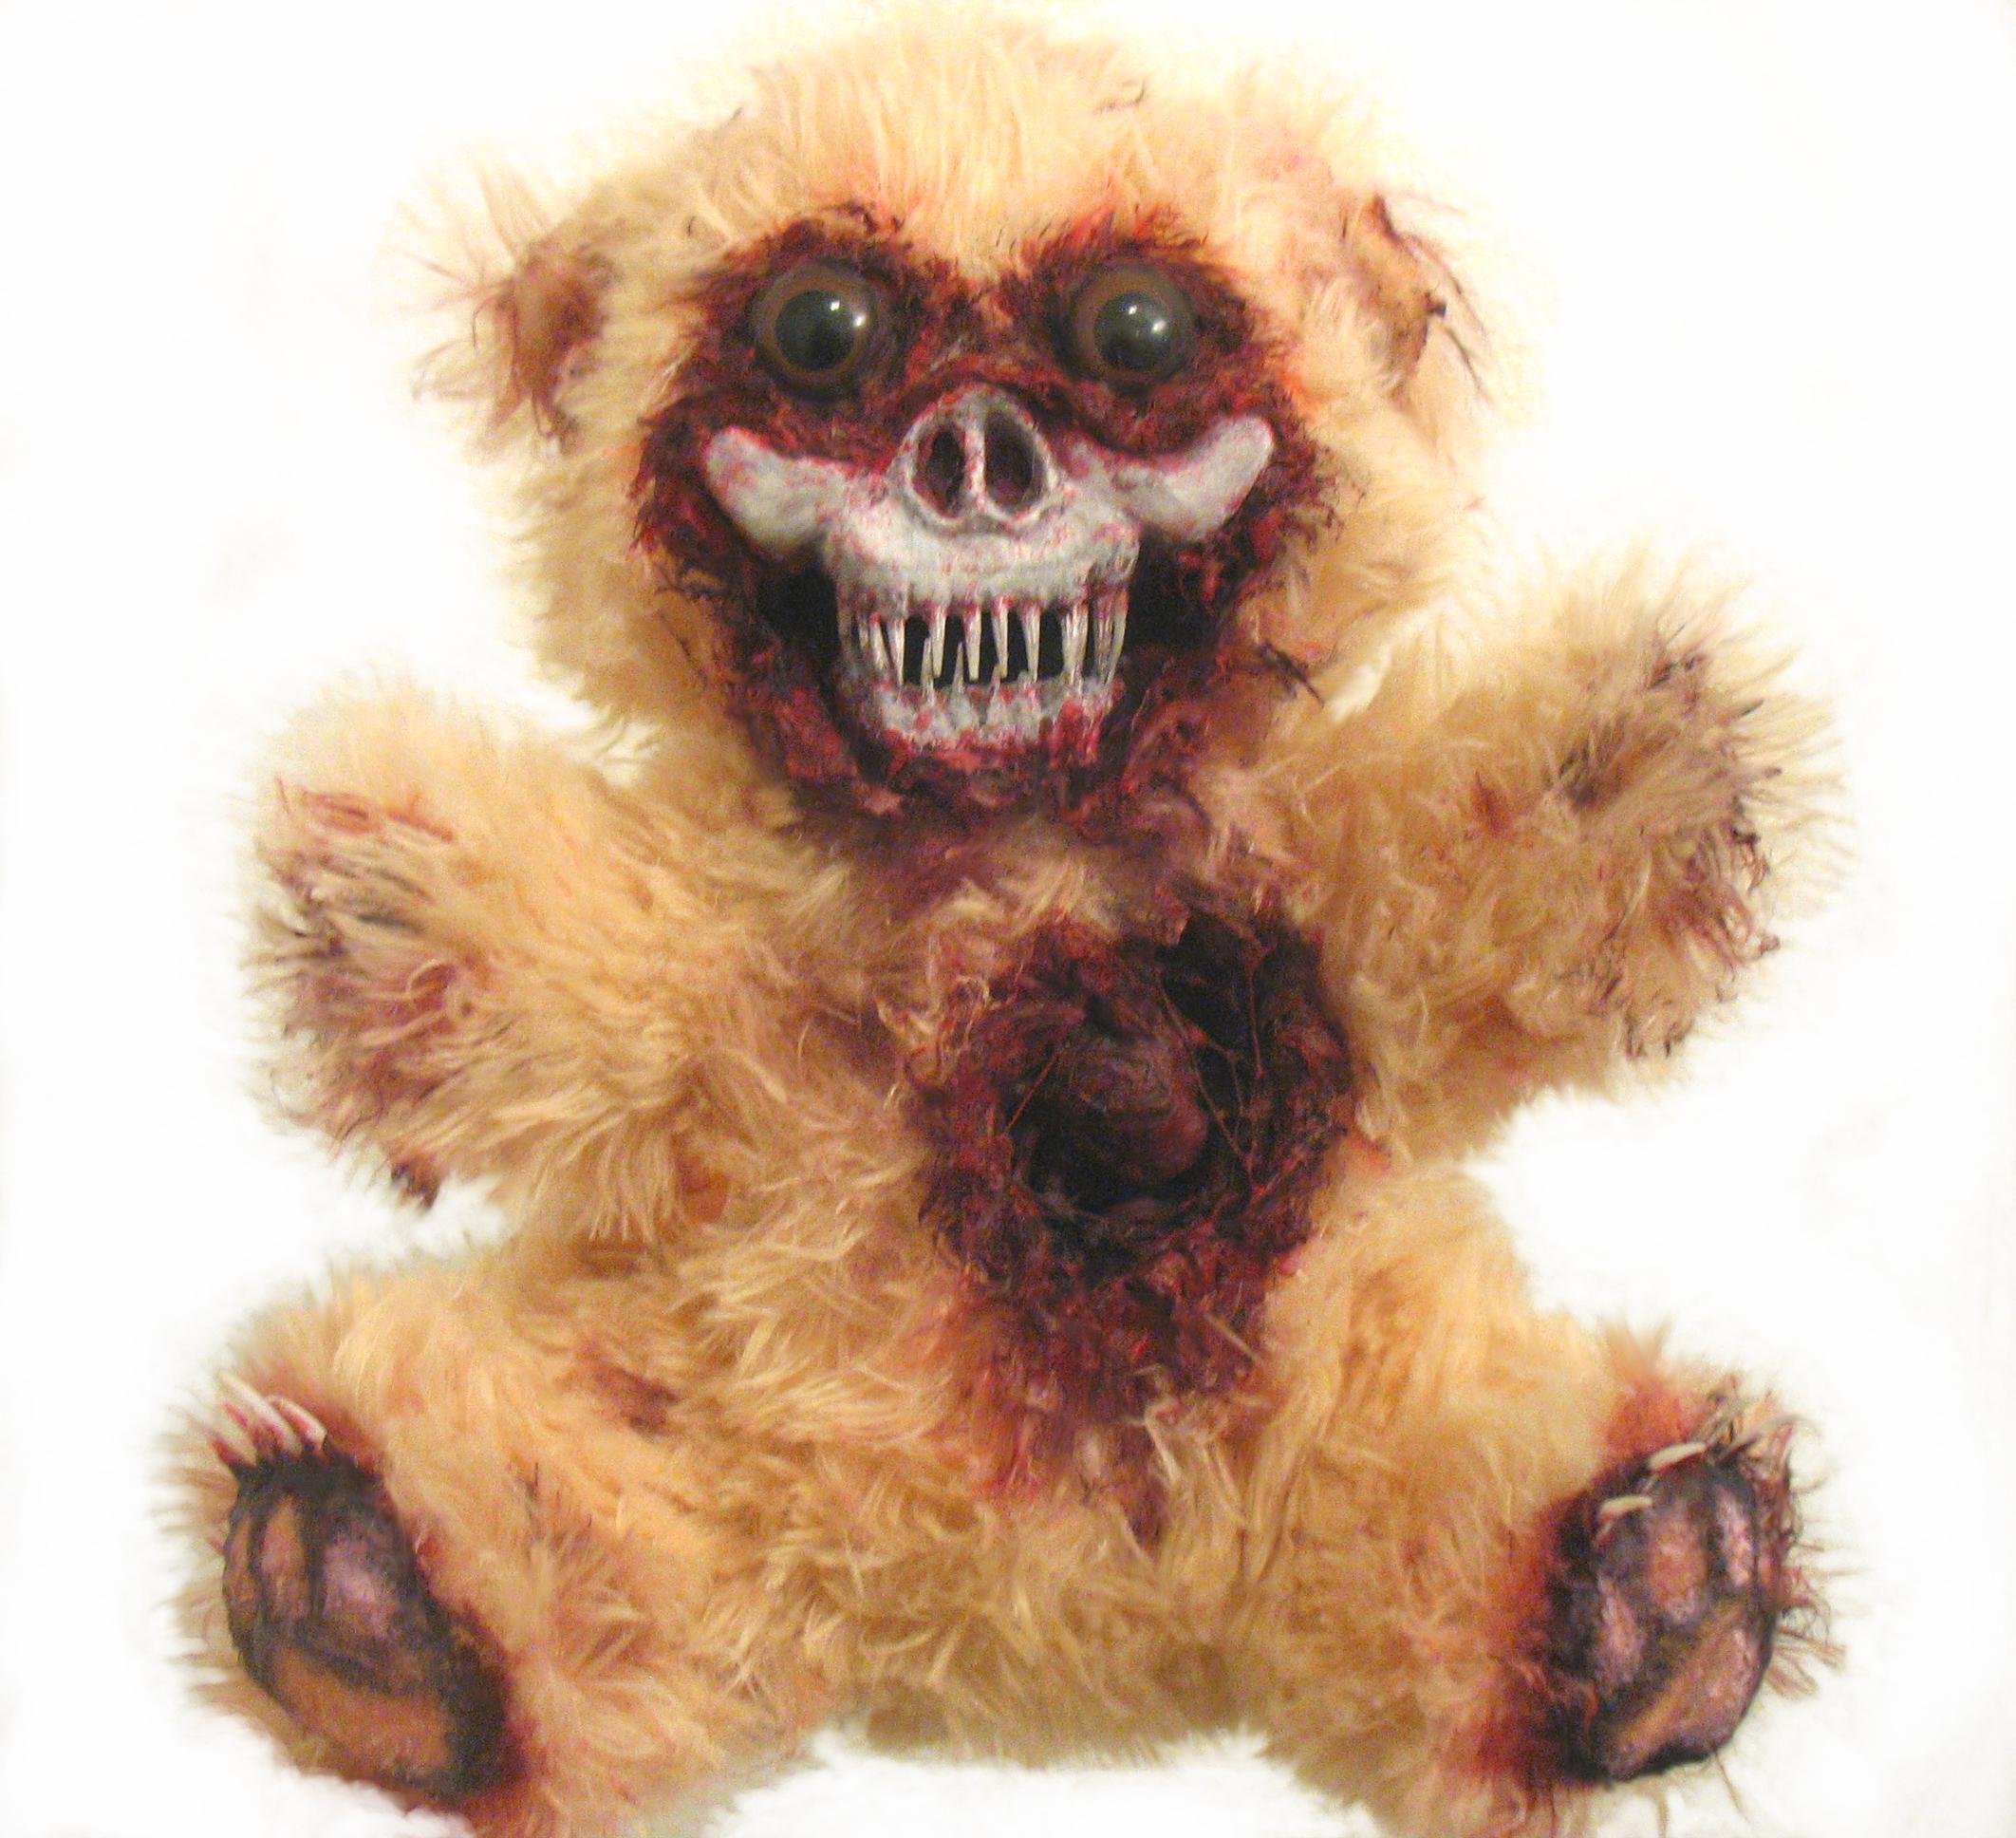 Freddy a nightmare on elm street - 3 part 9